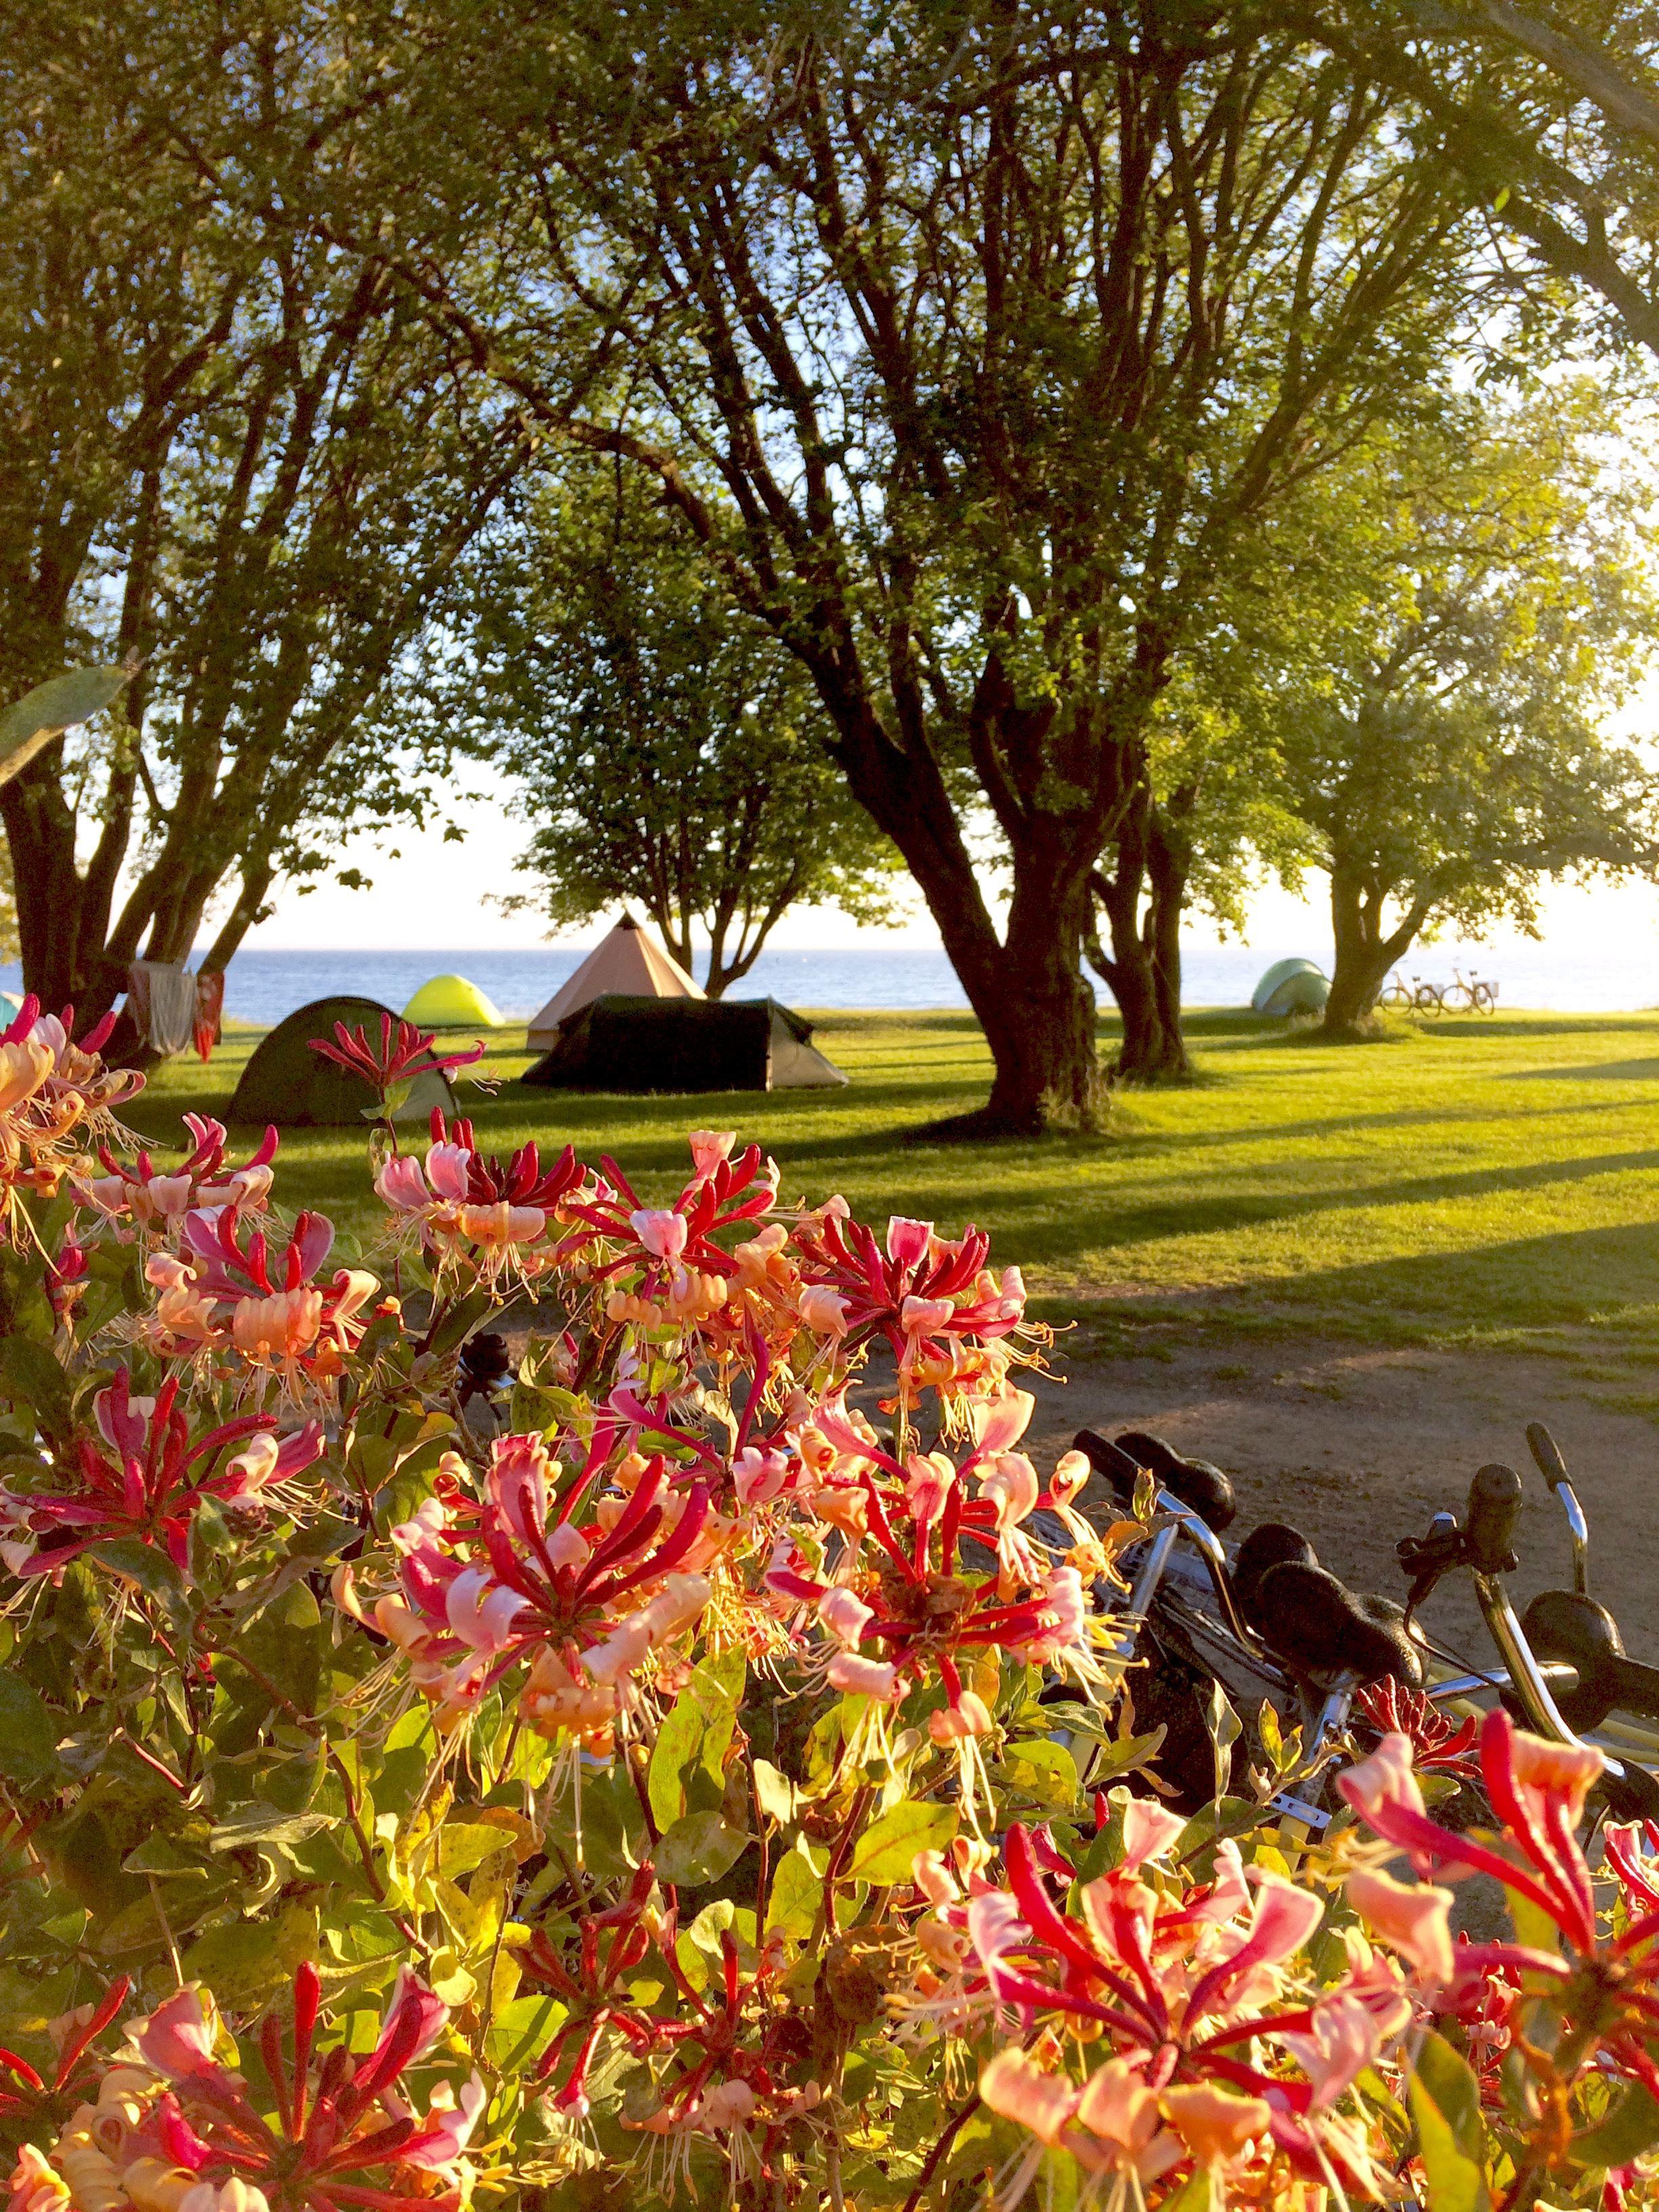 Camp Ven